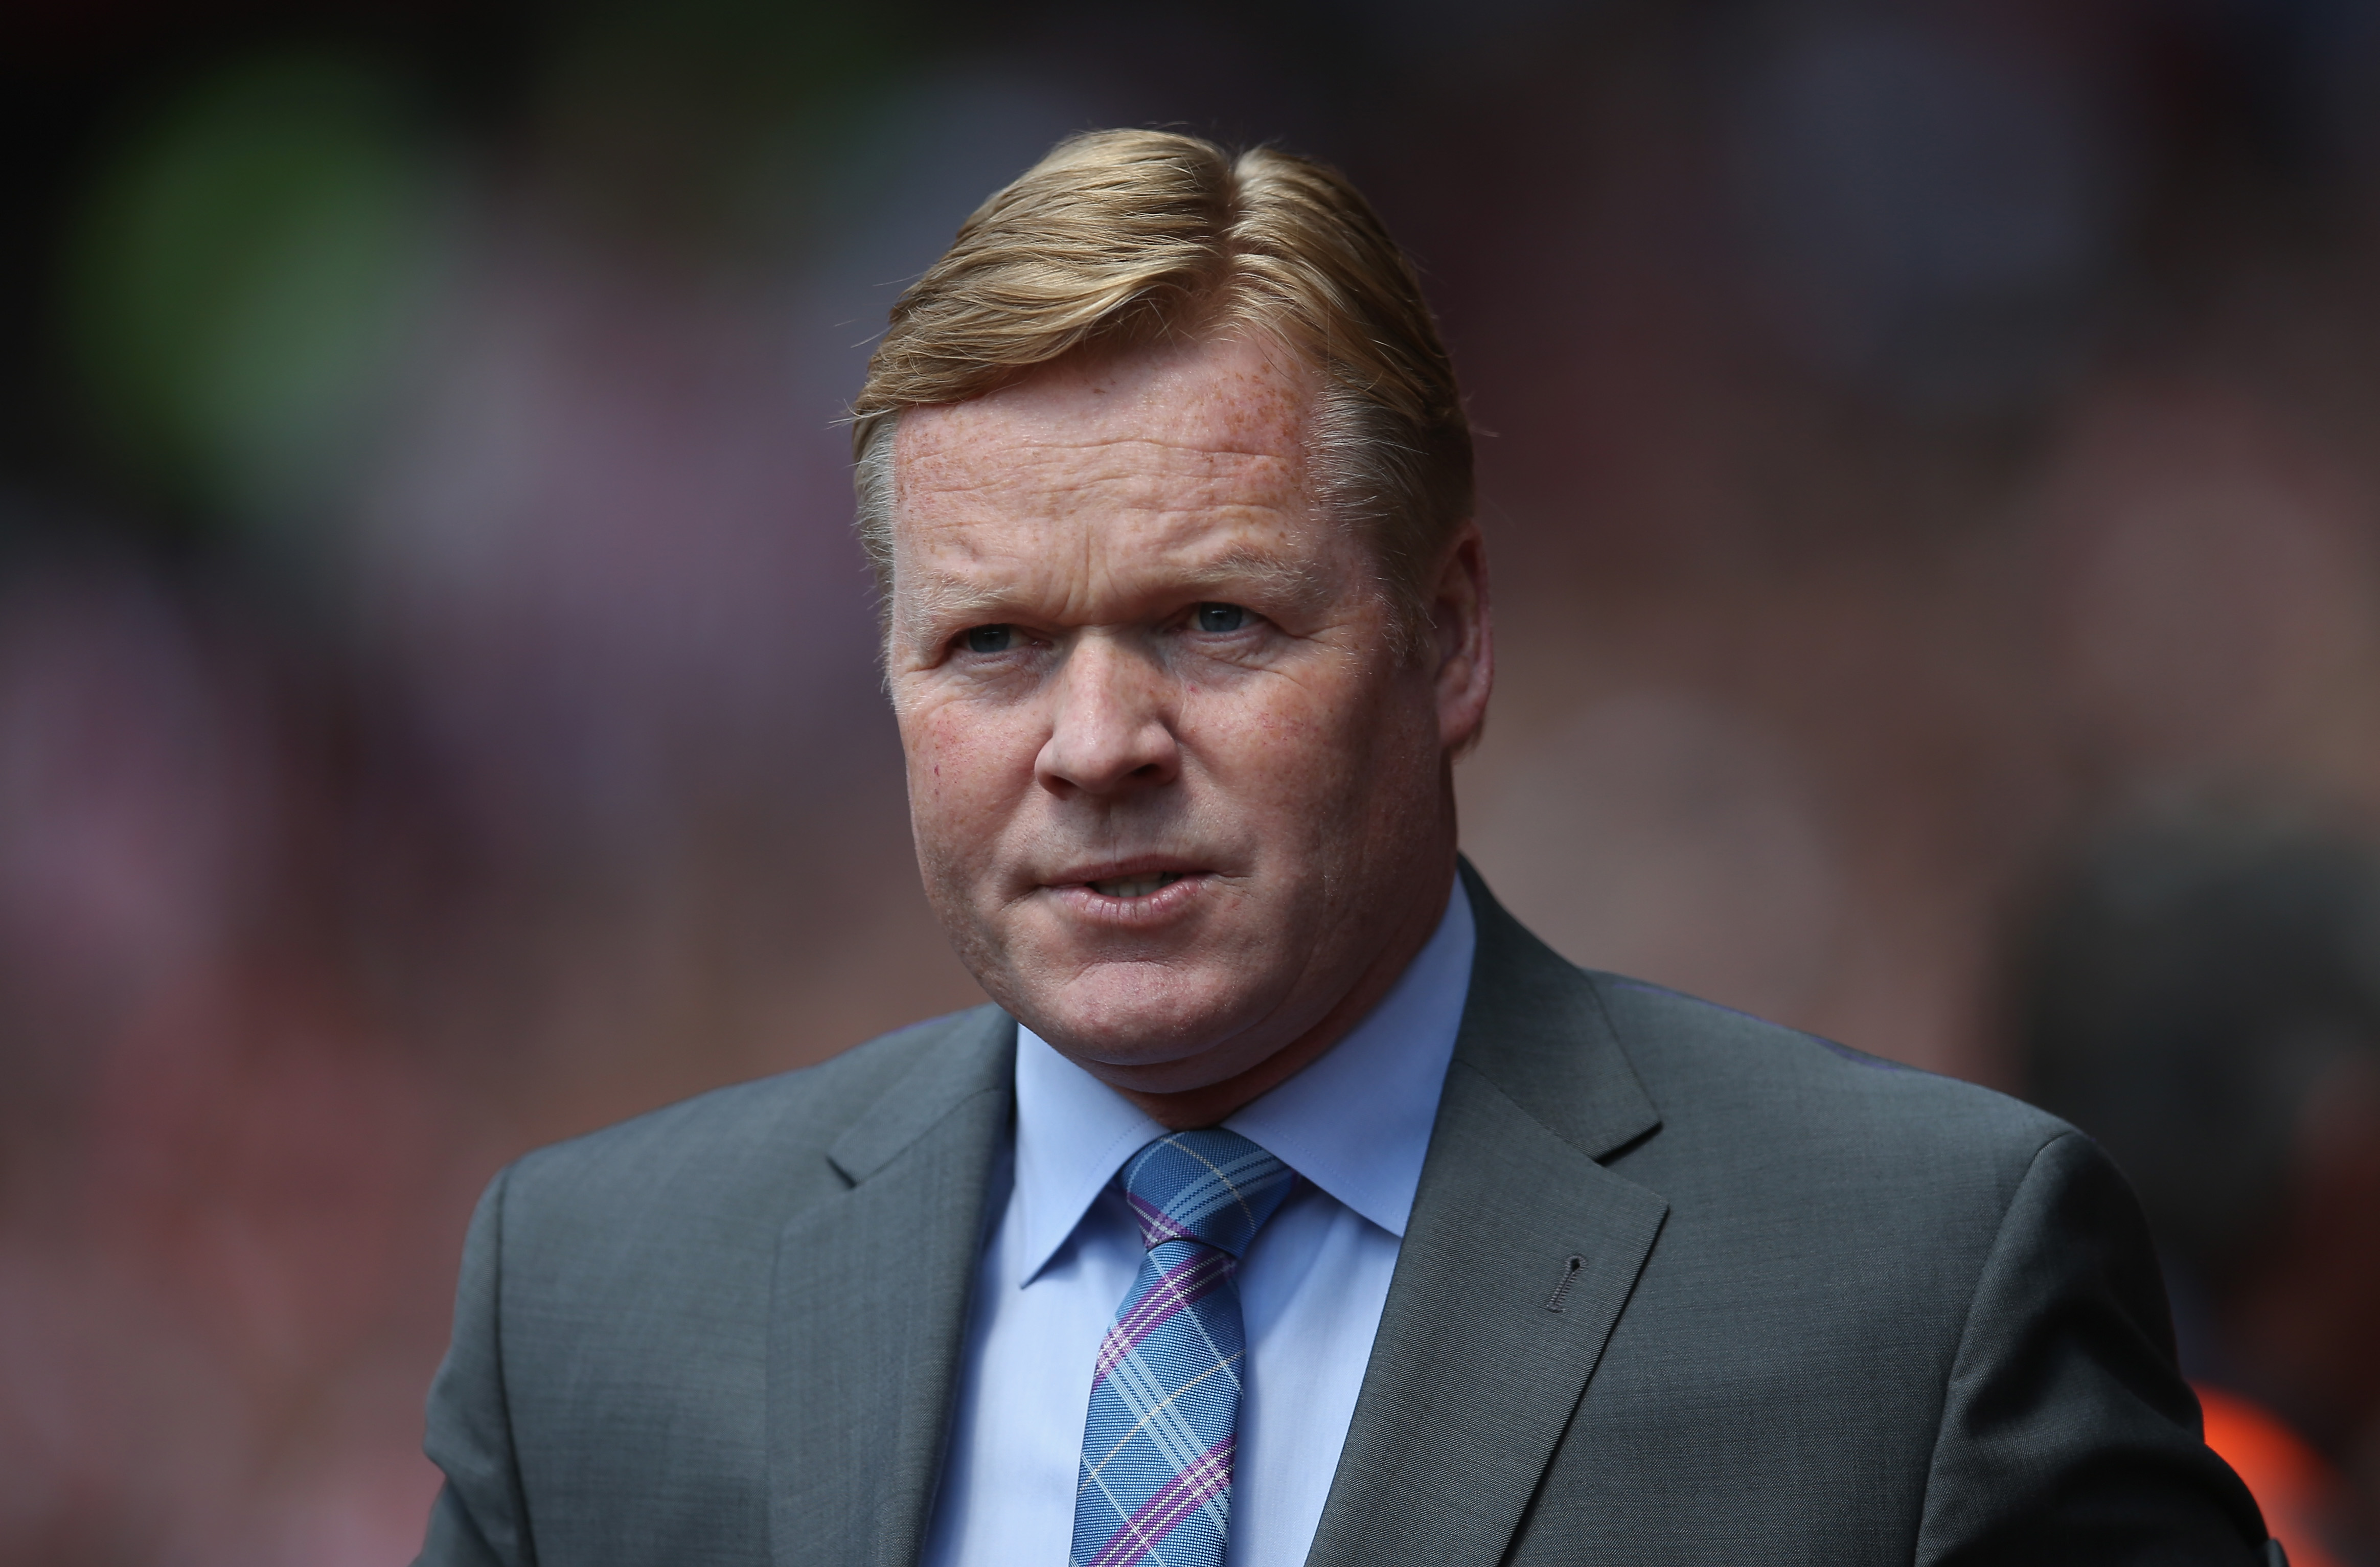 Southampton's Ronald Koeman to snub Everton in hope of getting Arsenal job